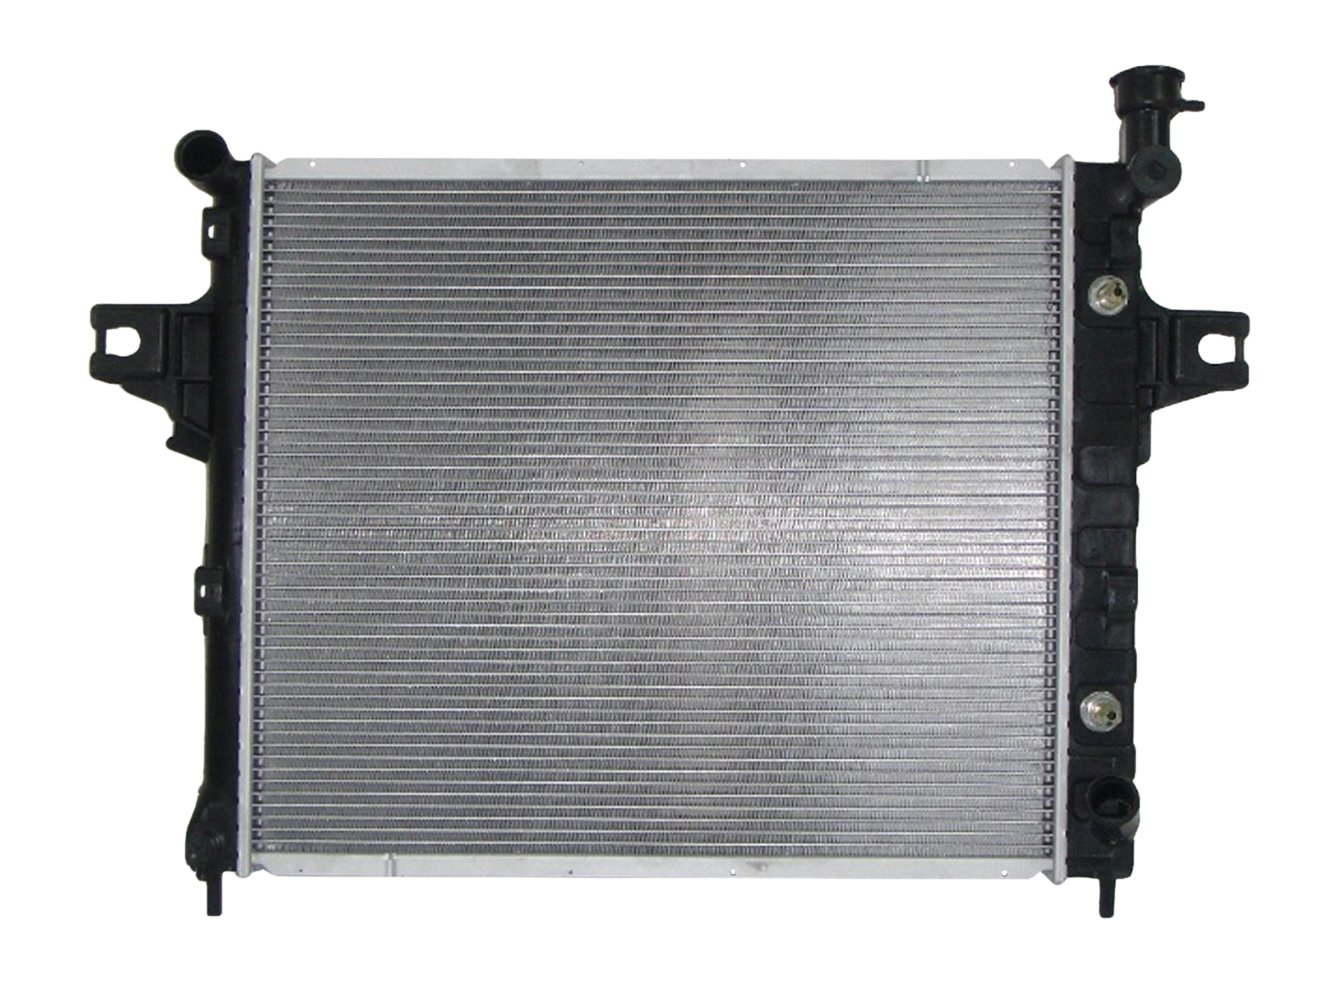 Amazon.com: Depo 333-56003-010 Radiator (JEEP GRAND CHEROKEE 4.7L V8